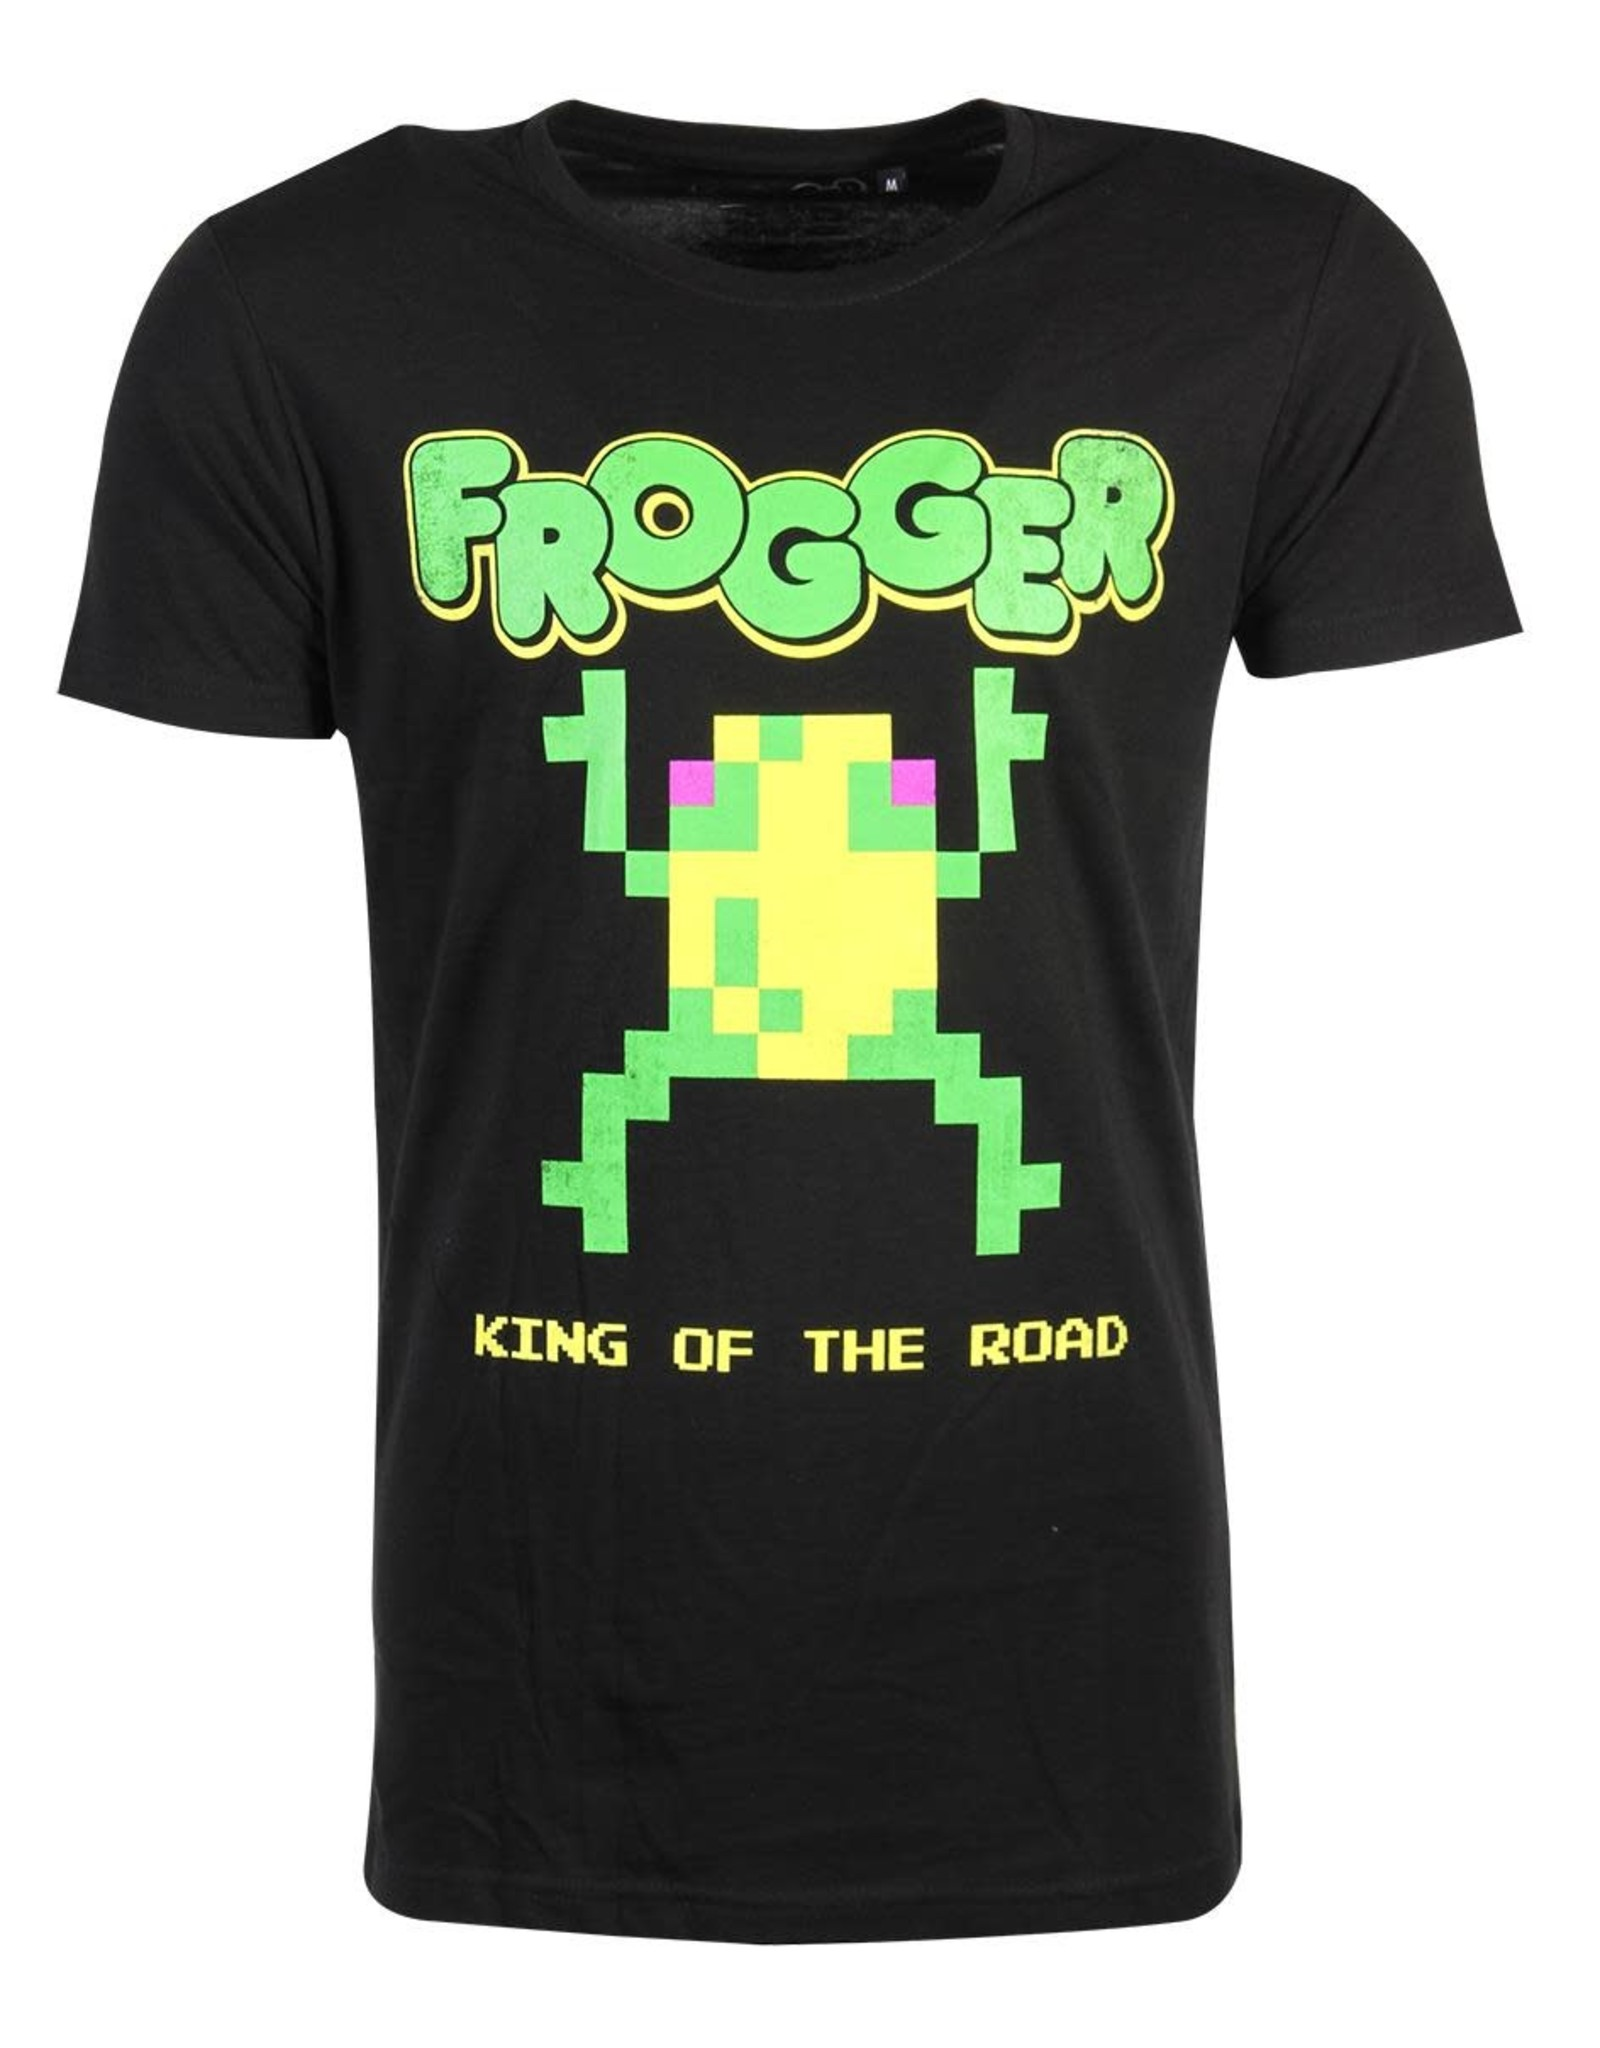 FROGGER  - Men T-Shirt King of the Road - (S)